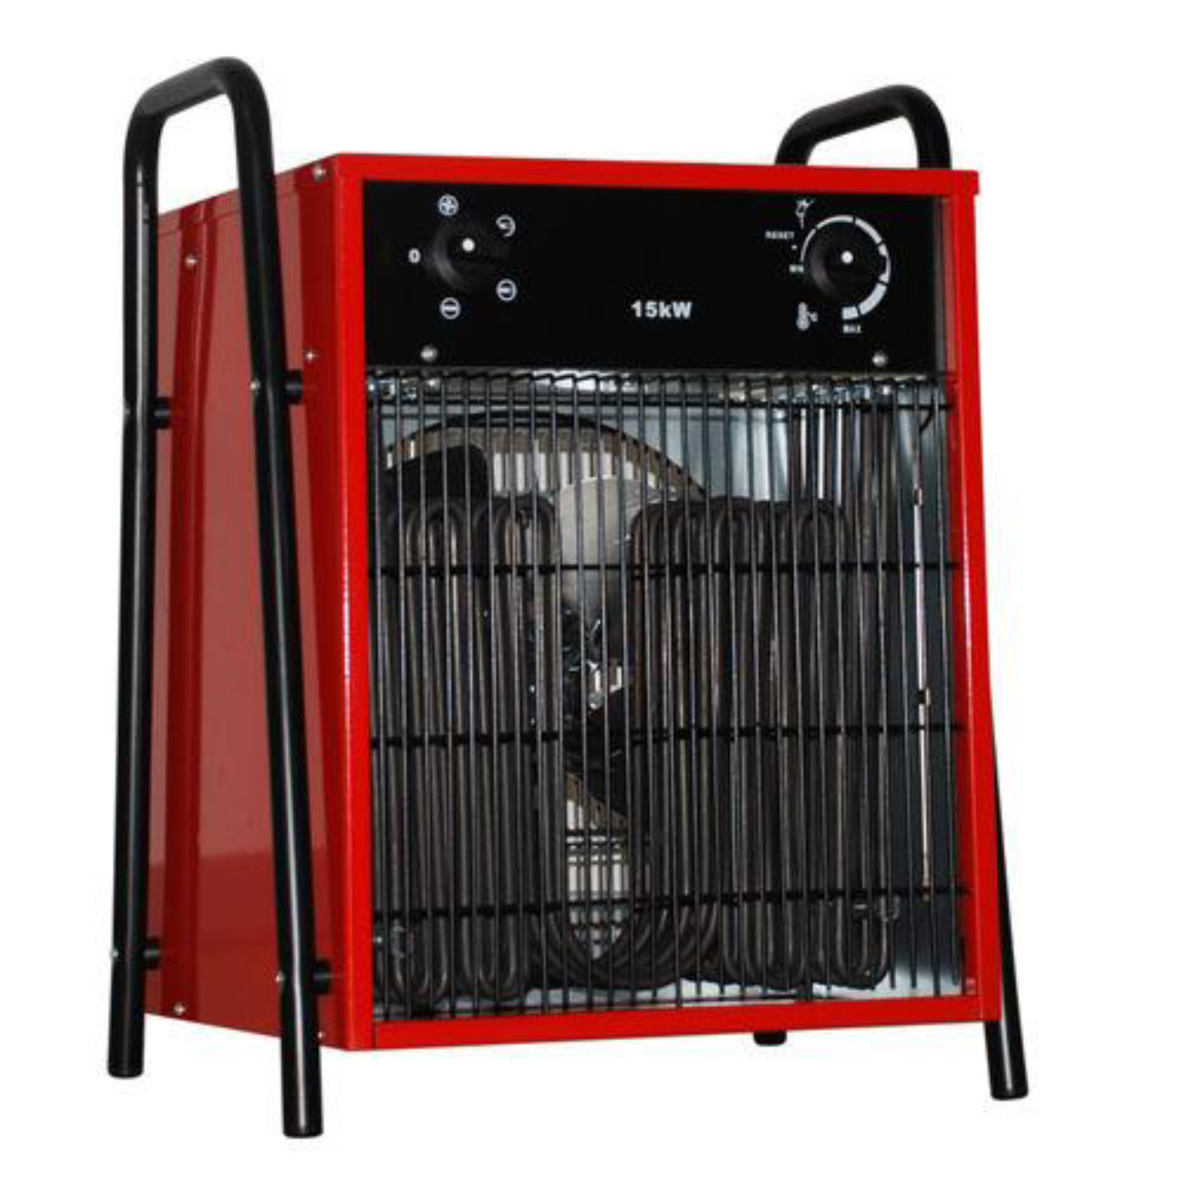 elektroheizl fter elektroheizer 15 0 kw watt. Black Bedroom Furniture Sets. Home Design Ideas